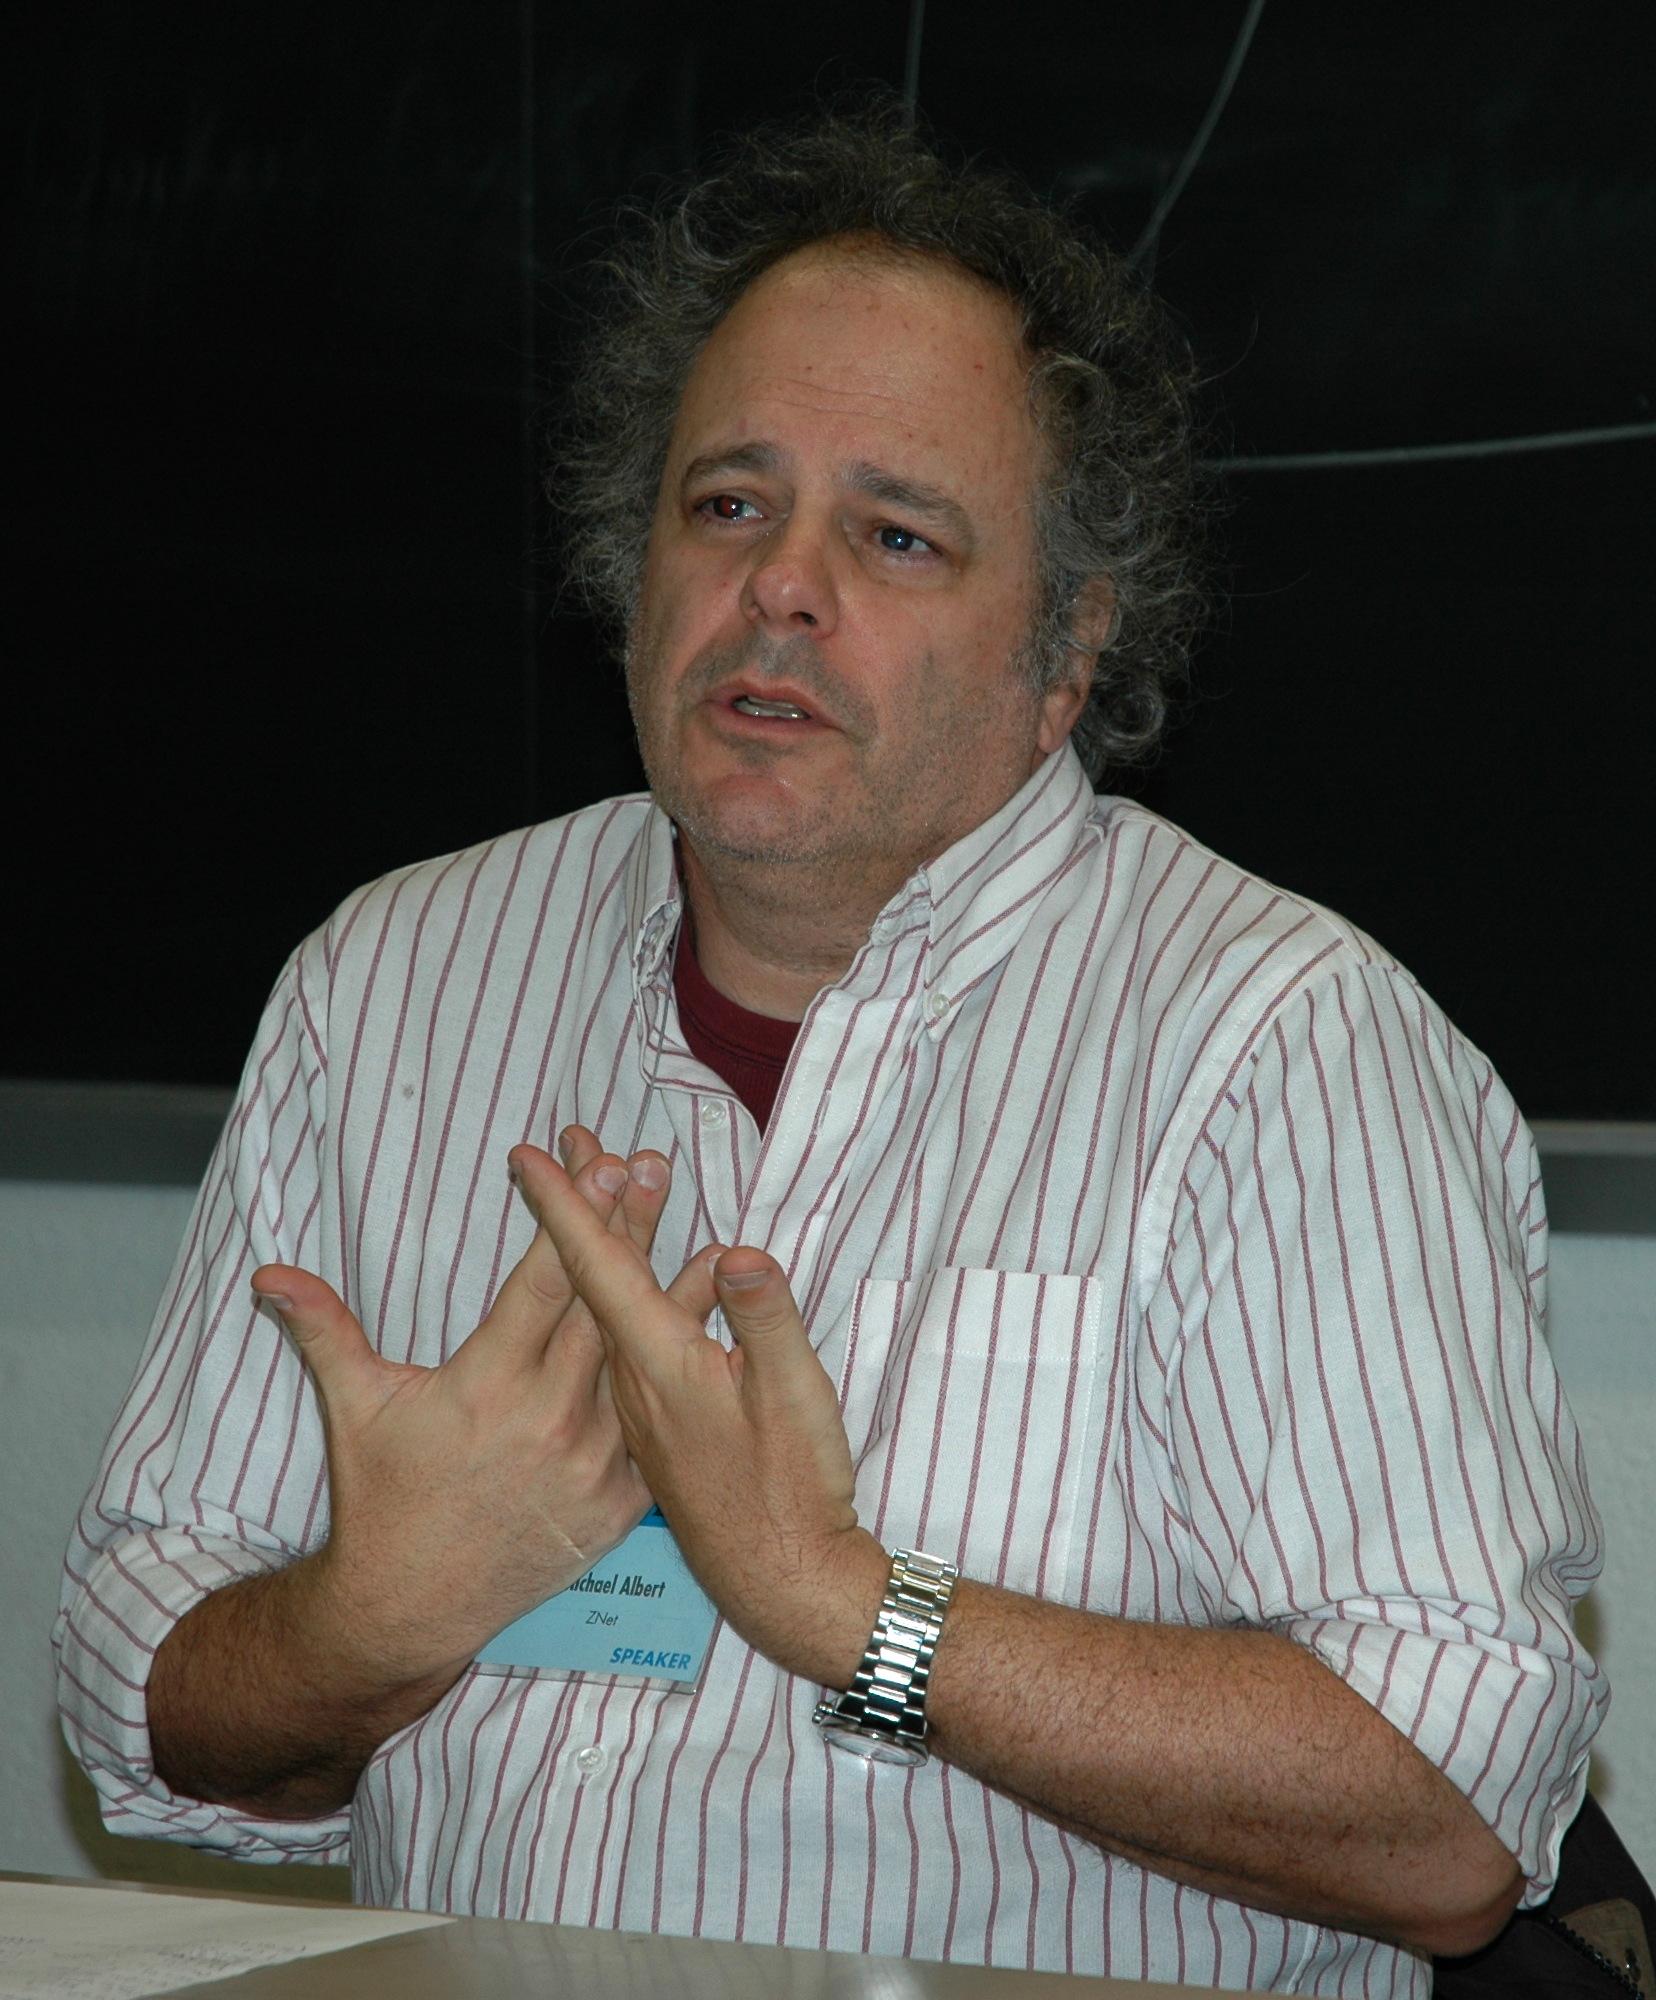 Michael Albert speaking at New York's annual Left Forum, 2007.